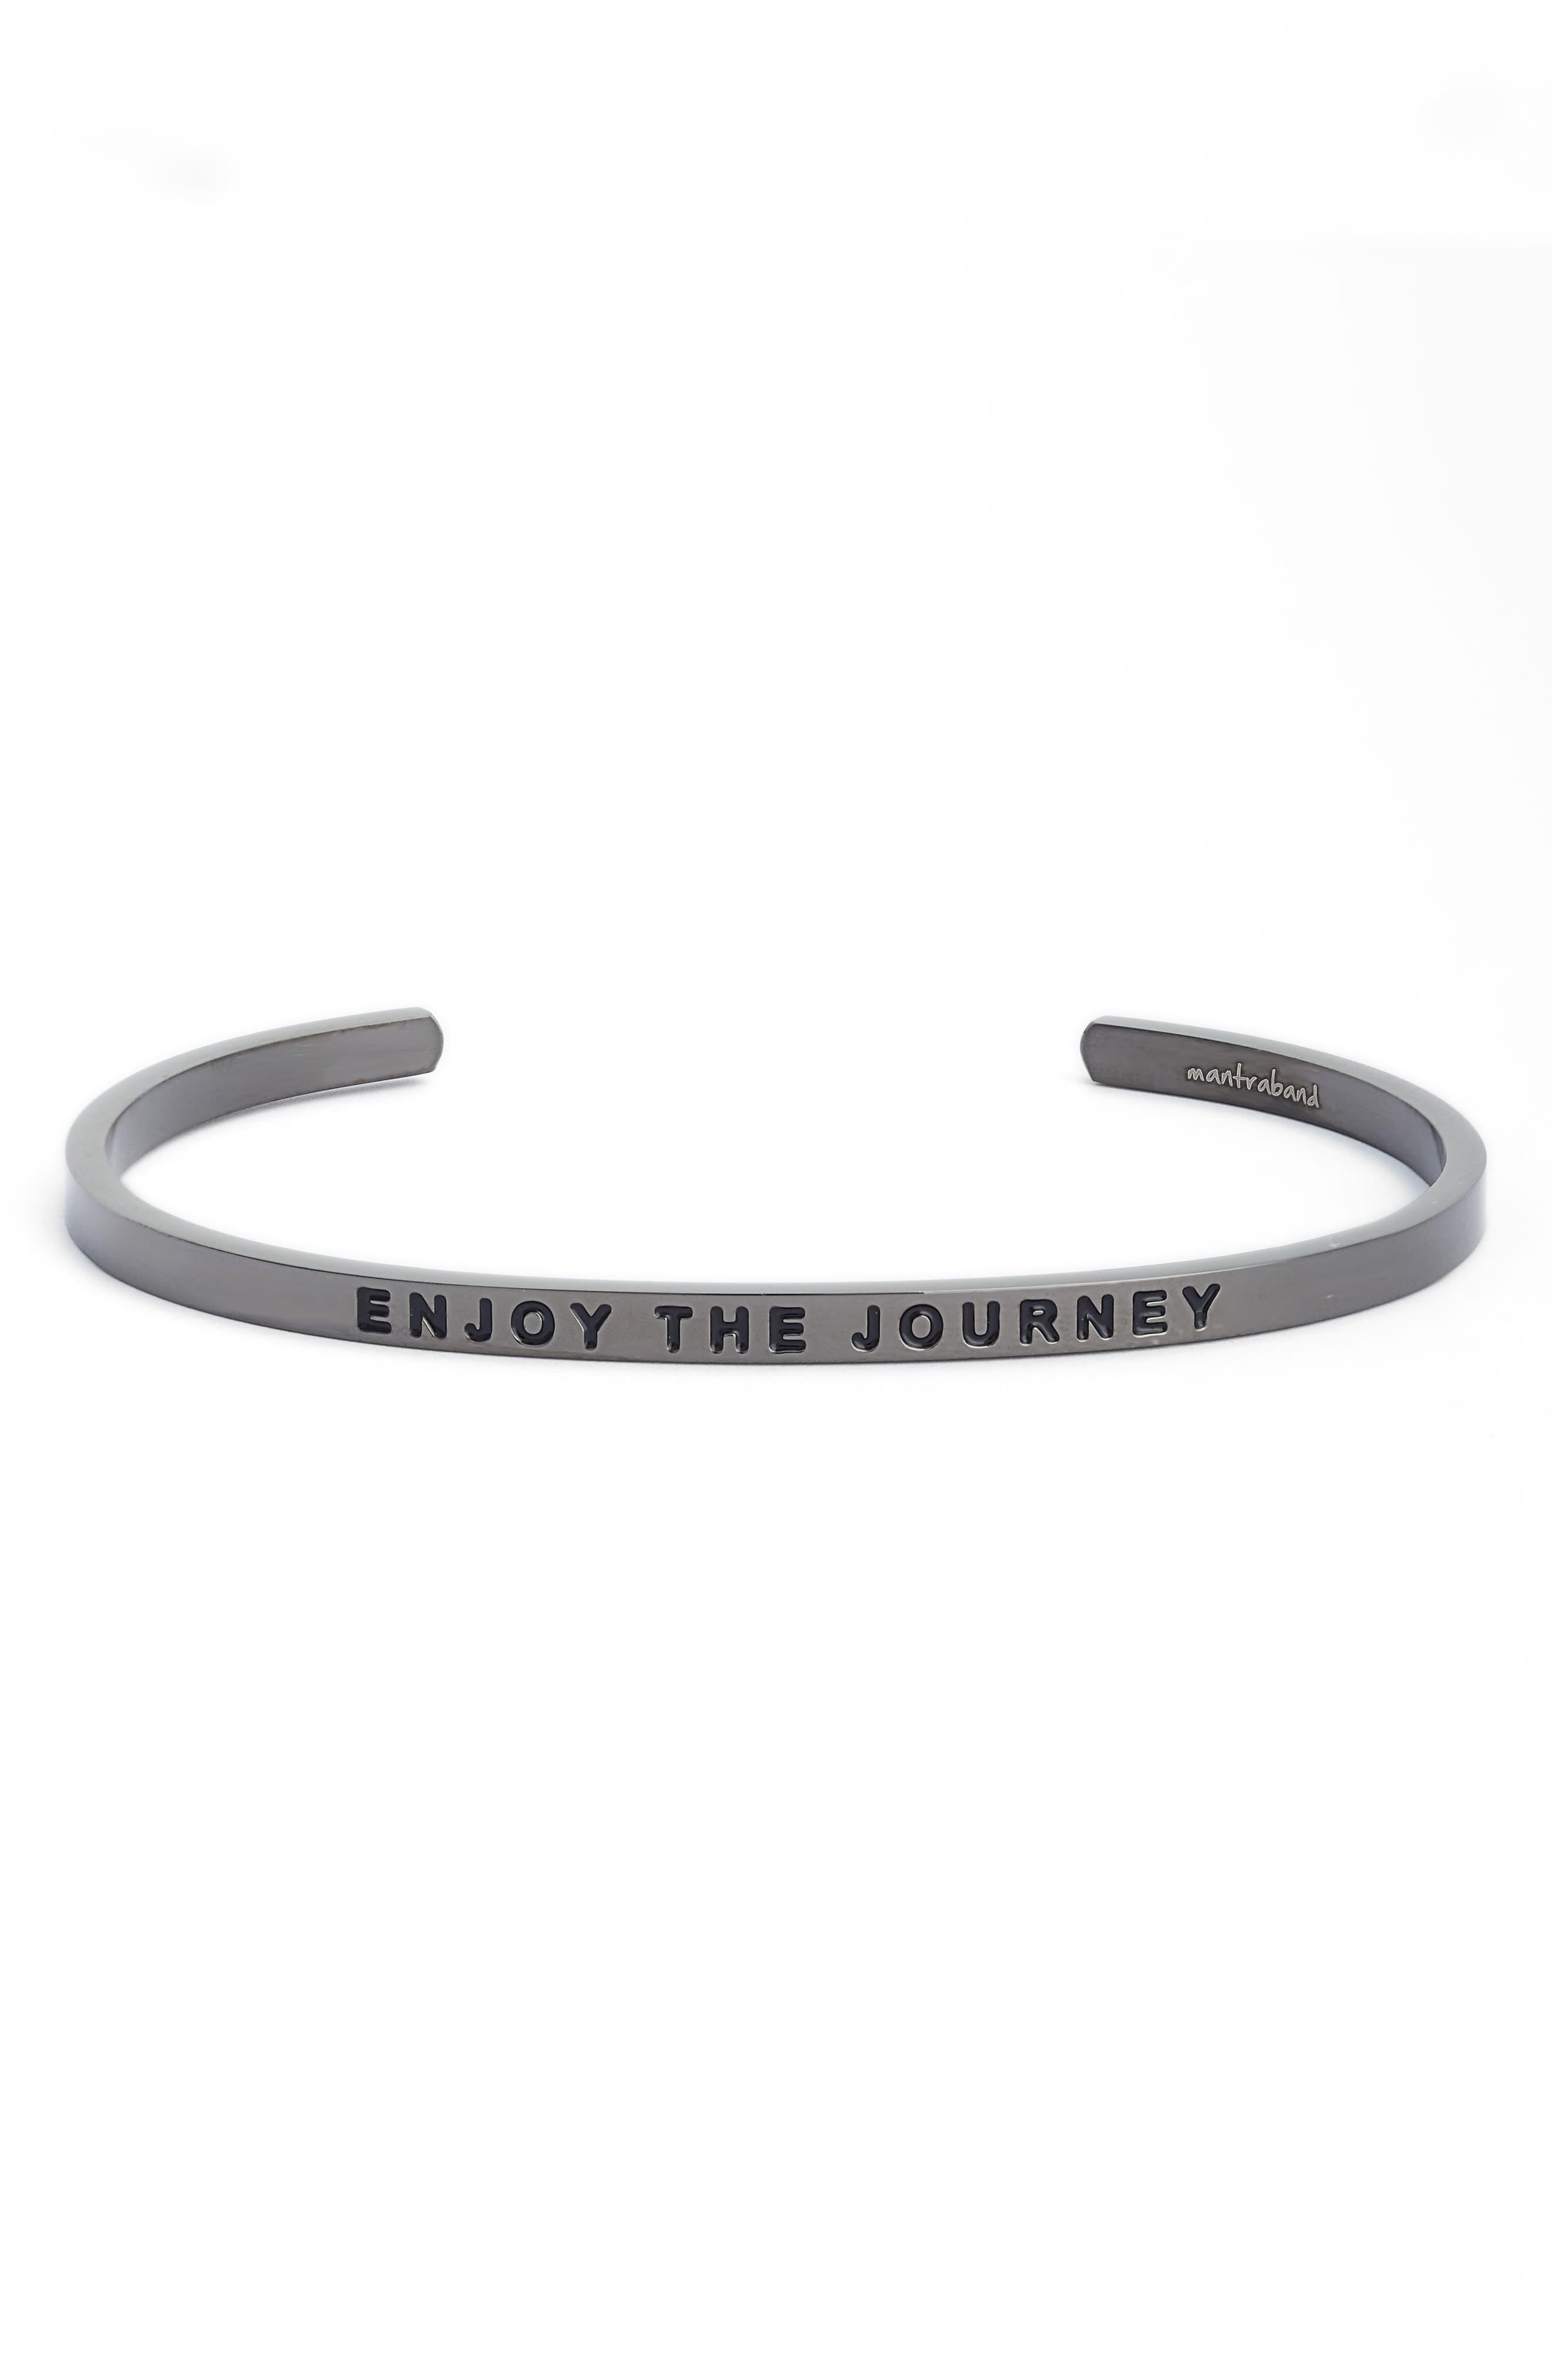 MantraBand® Enjoy the Journey Cuff Bracelet